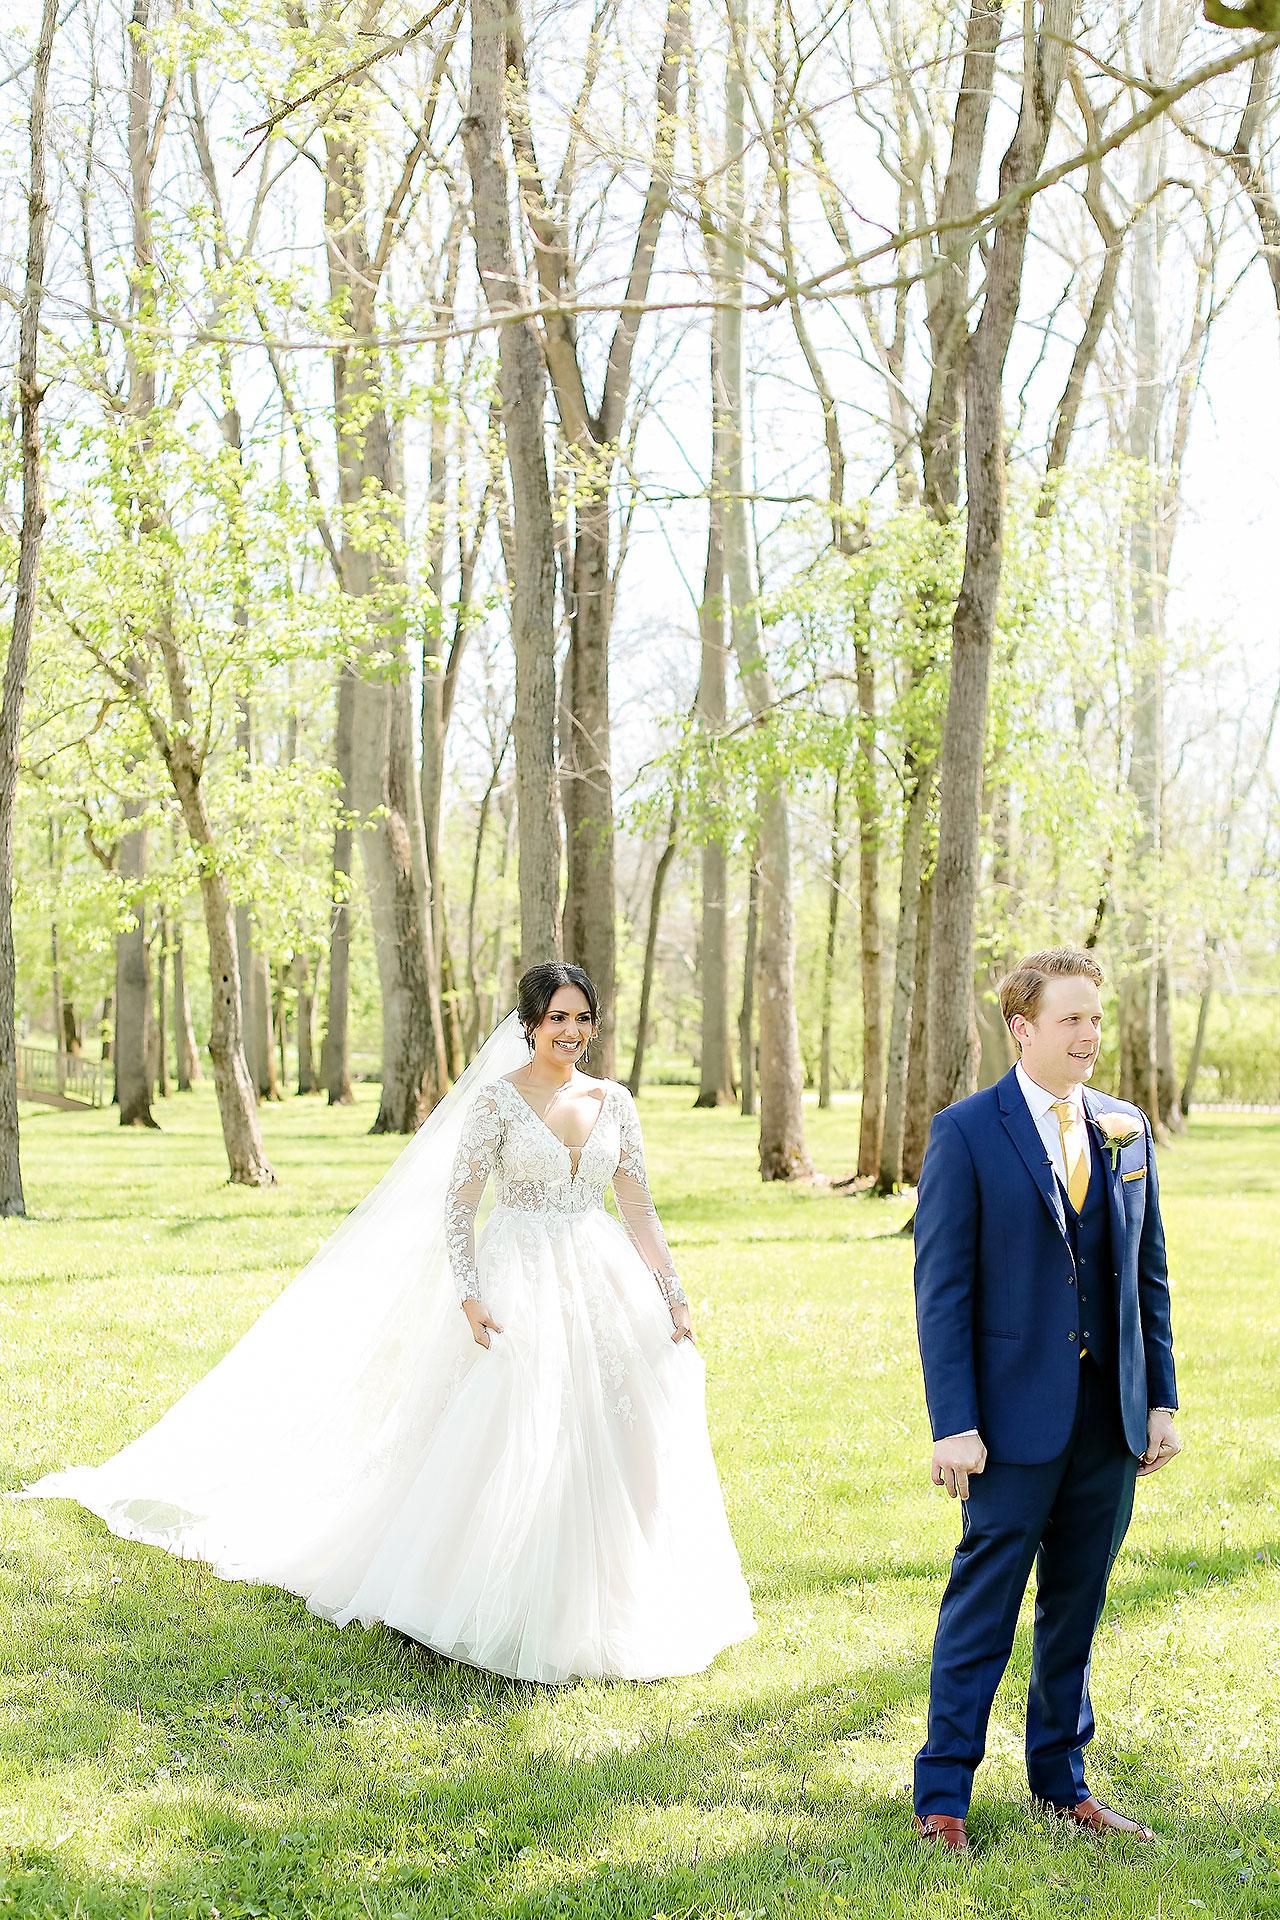 Nadia Parker Black Iris Estate Carmel Indiana Wedding May 2021 048